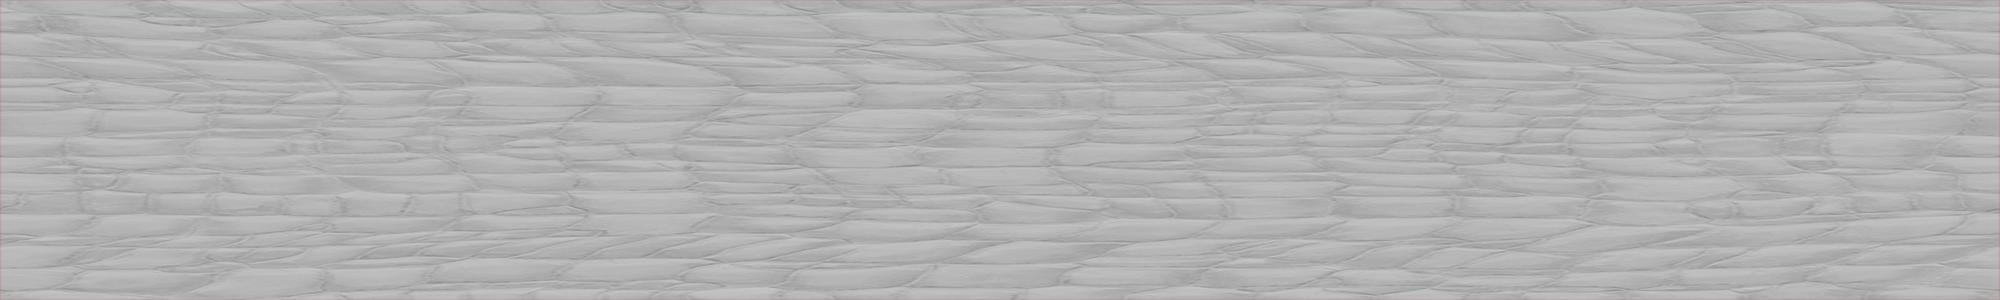 Textura gris claro